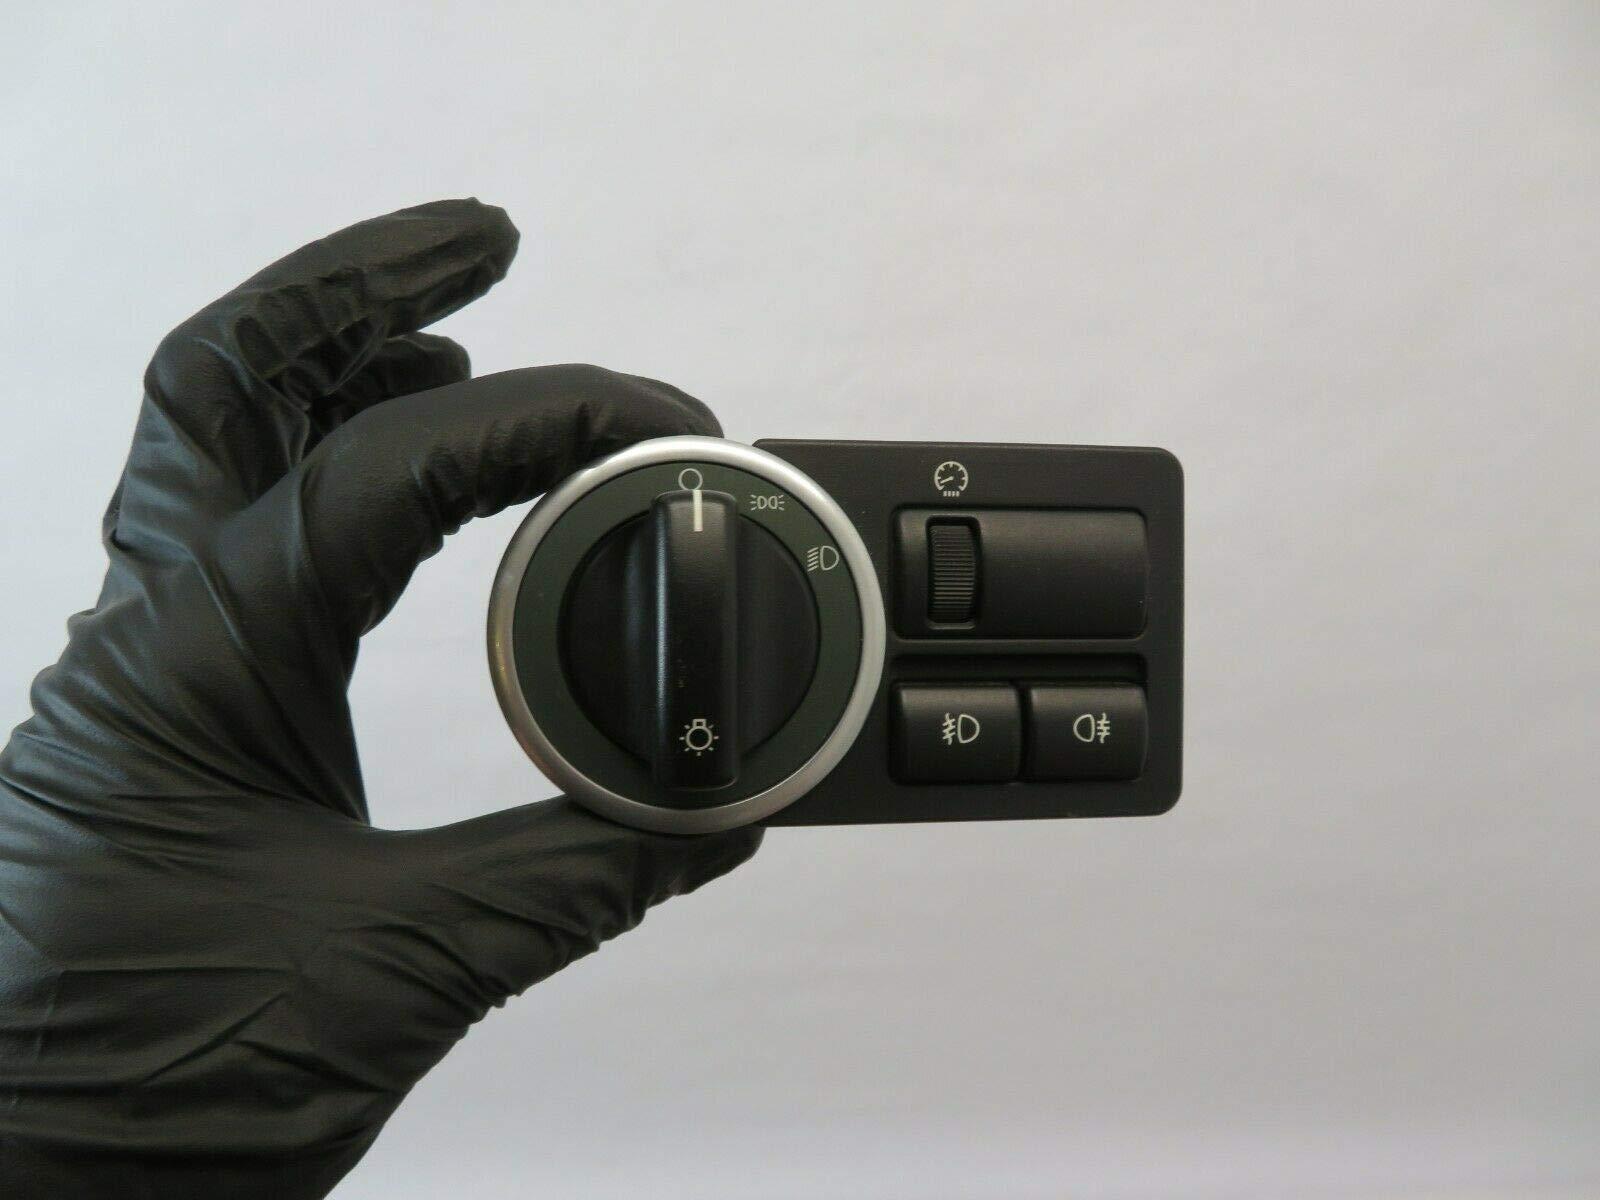 Hiscarpart #3942D Range Rover OEM ON Off Headlight Head Light LAMP Control Switch